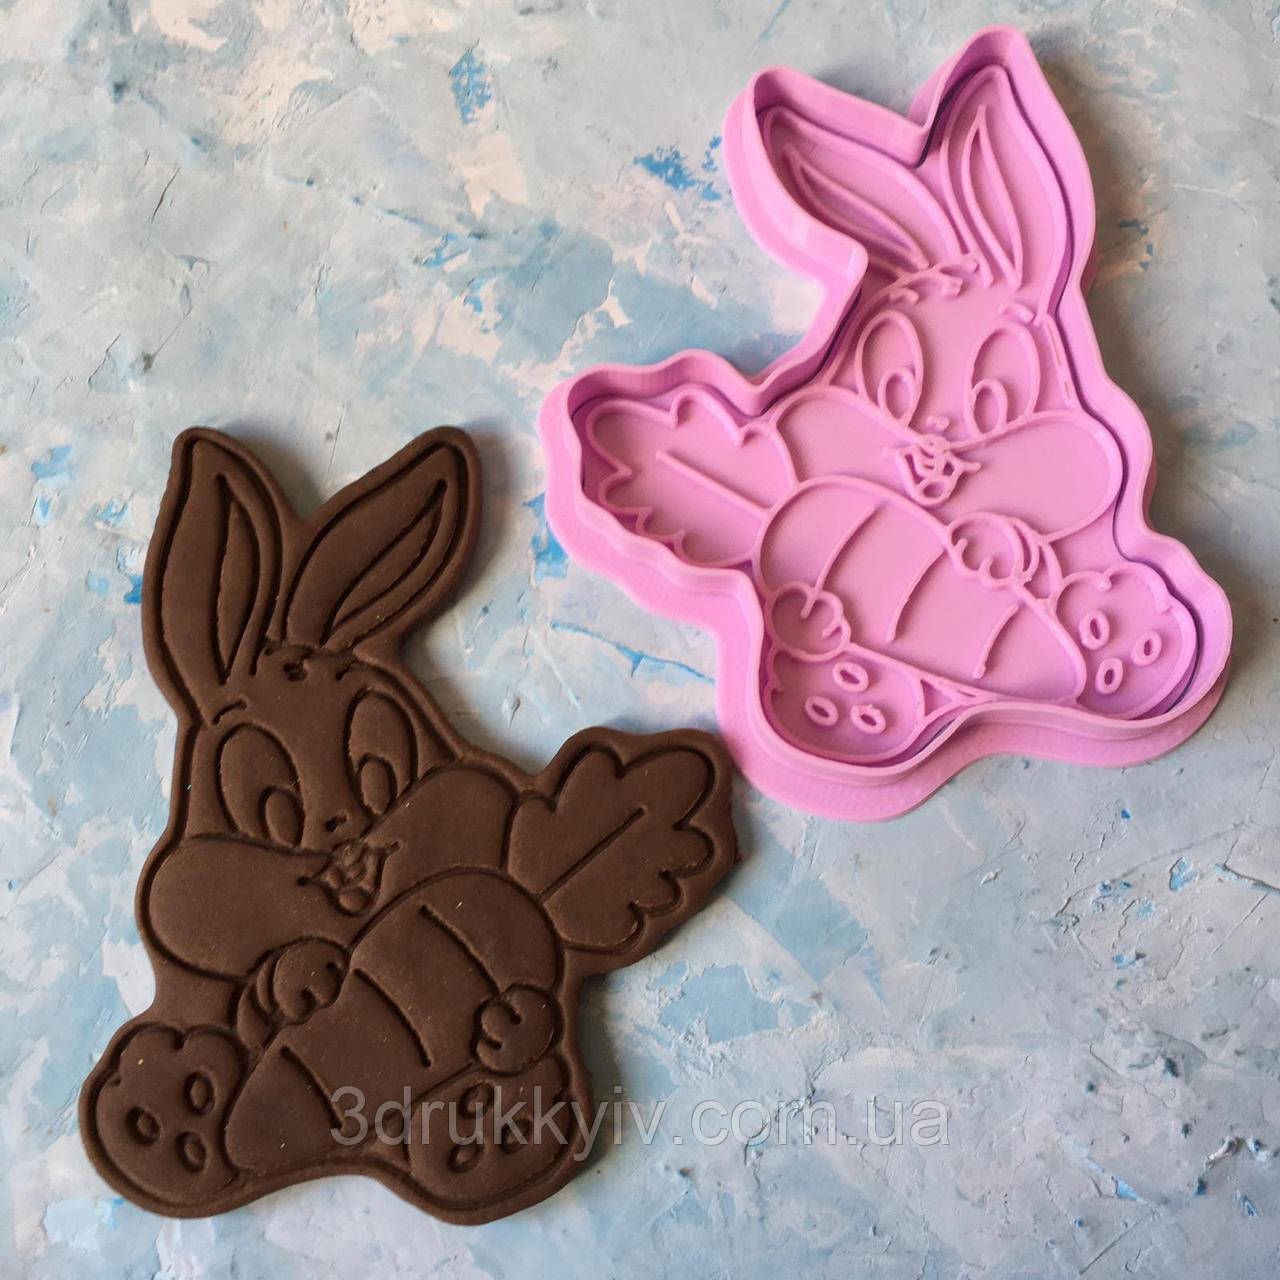 "Вирубка зі штампом ""Кролик"" / Вырубка - формочка со штампом для пряников"